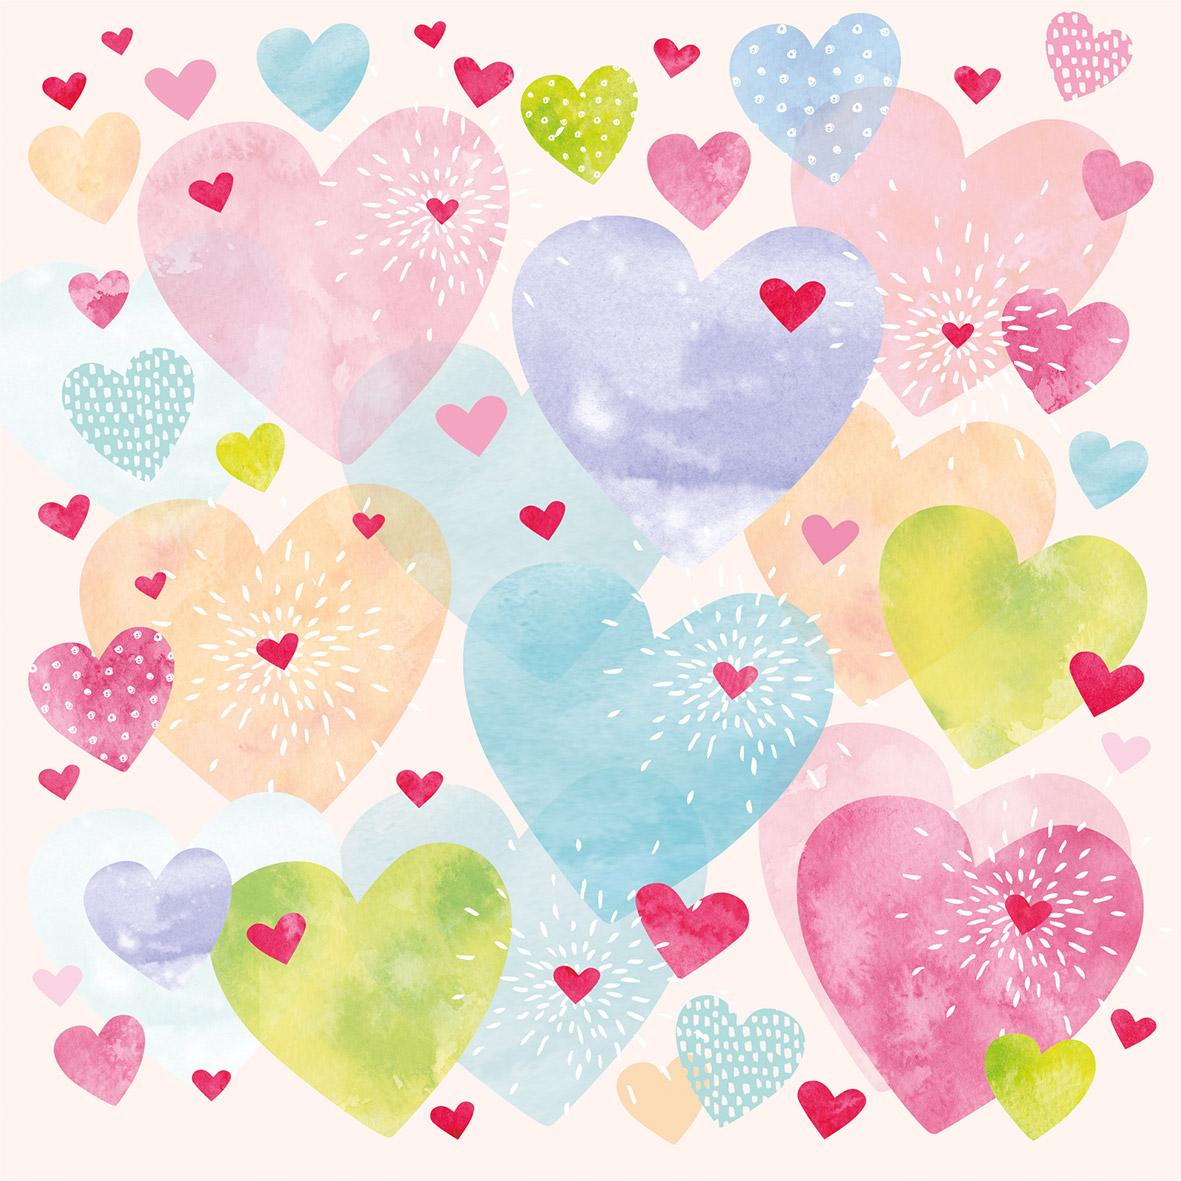 Konfetti Hearts 33x33 cm